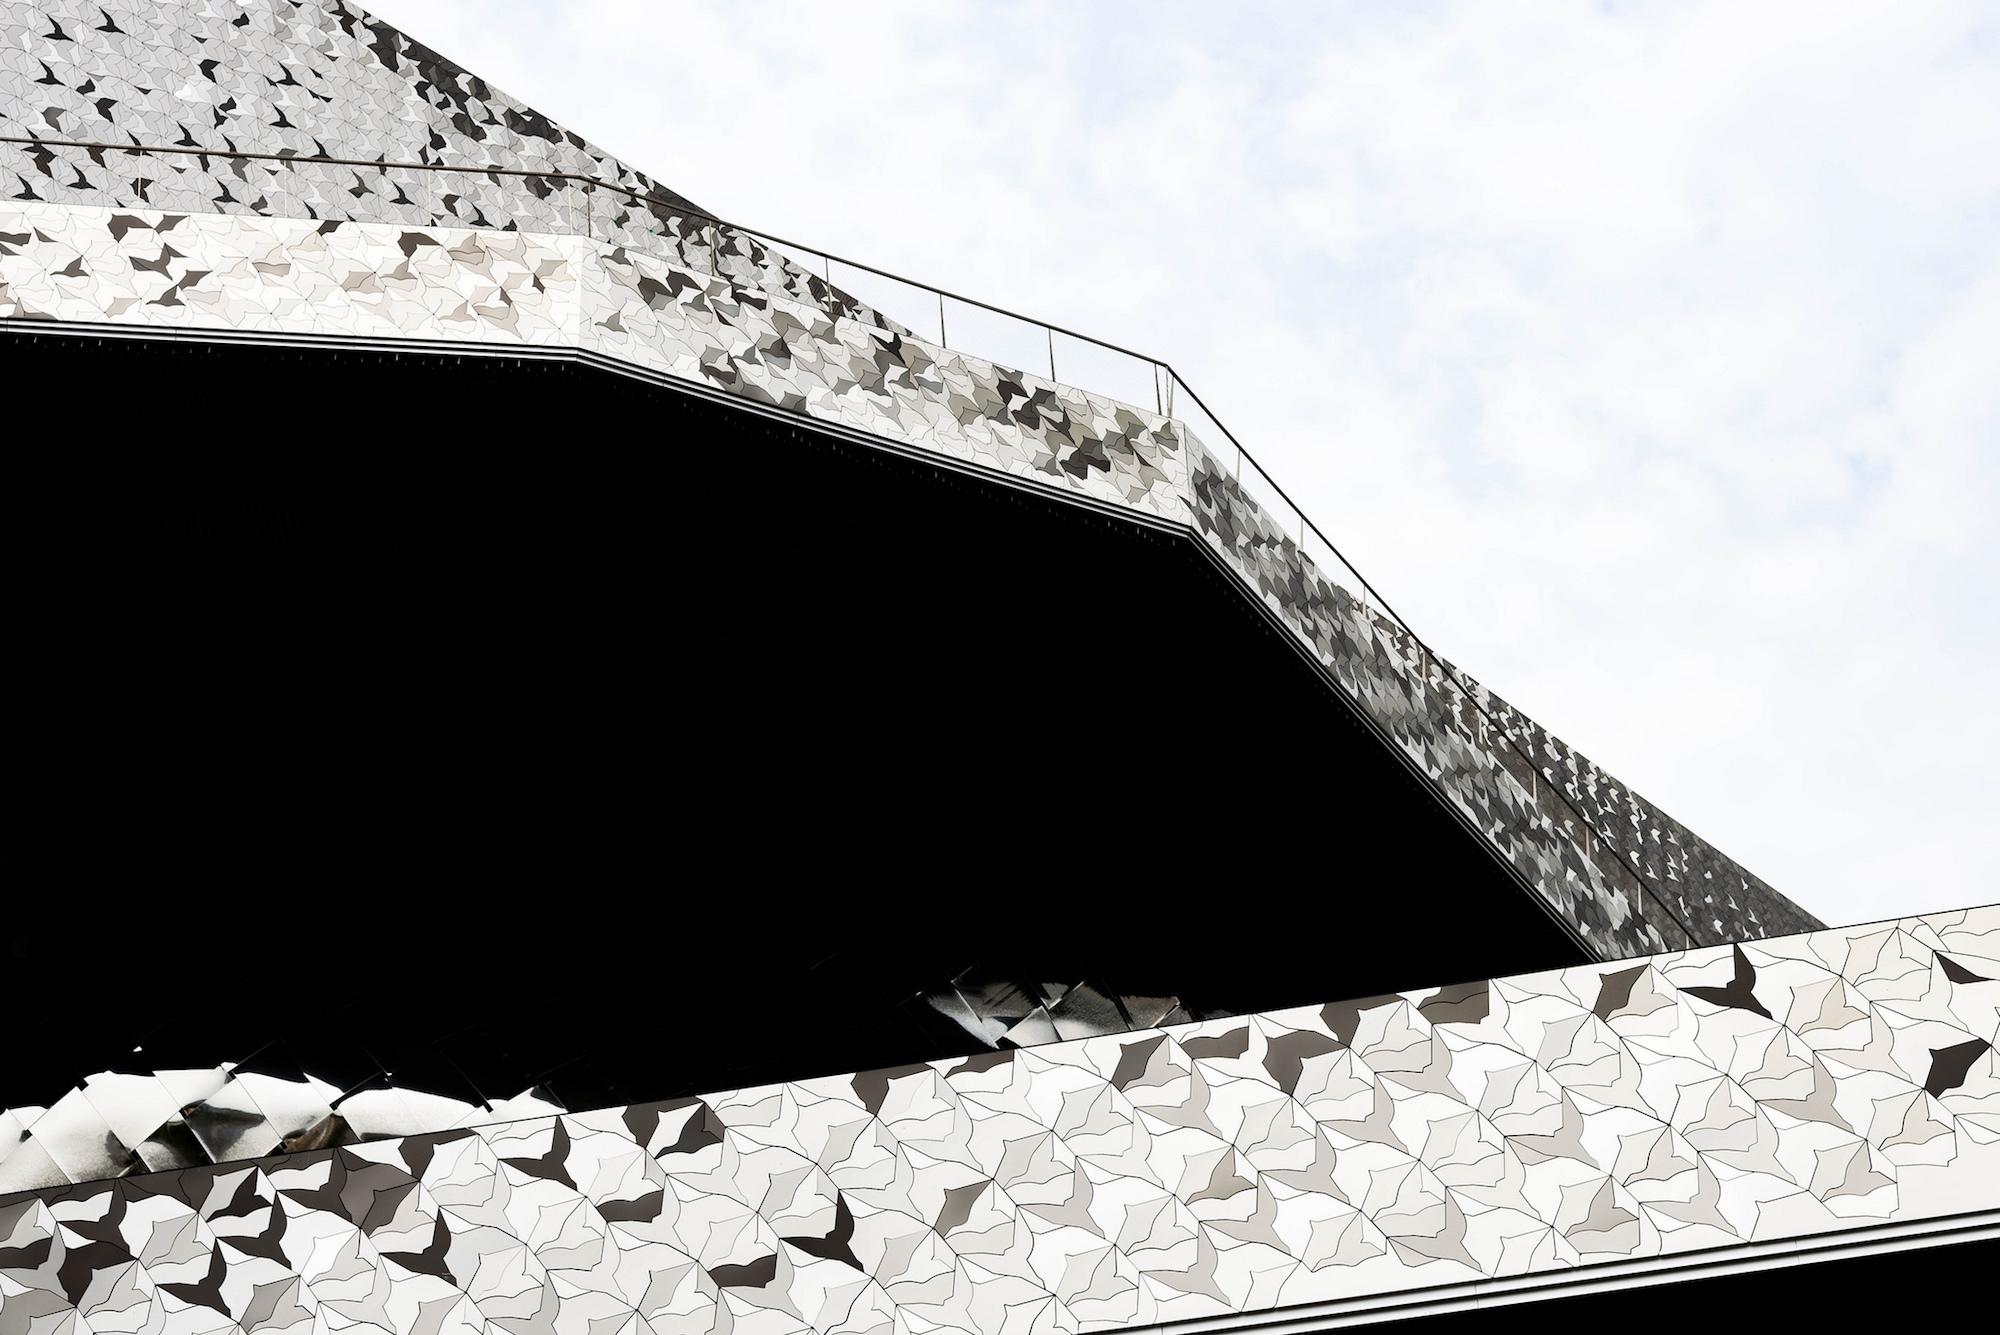 La Philharmonie de Paris, Joe deSousa, Flickr, HiP Paris